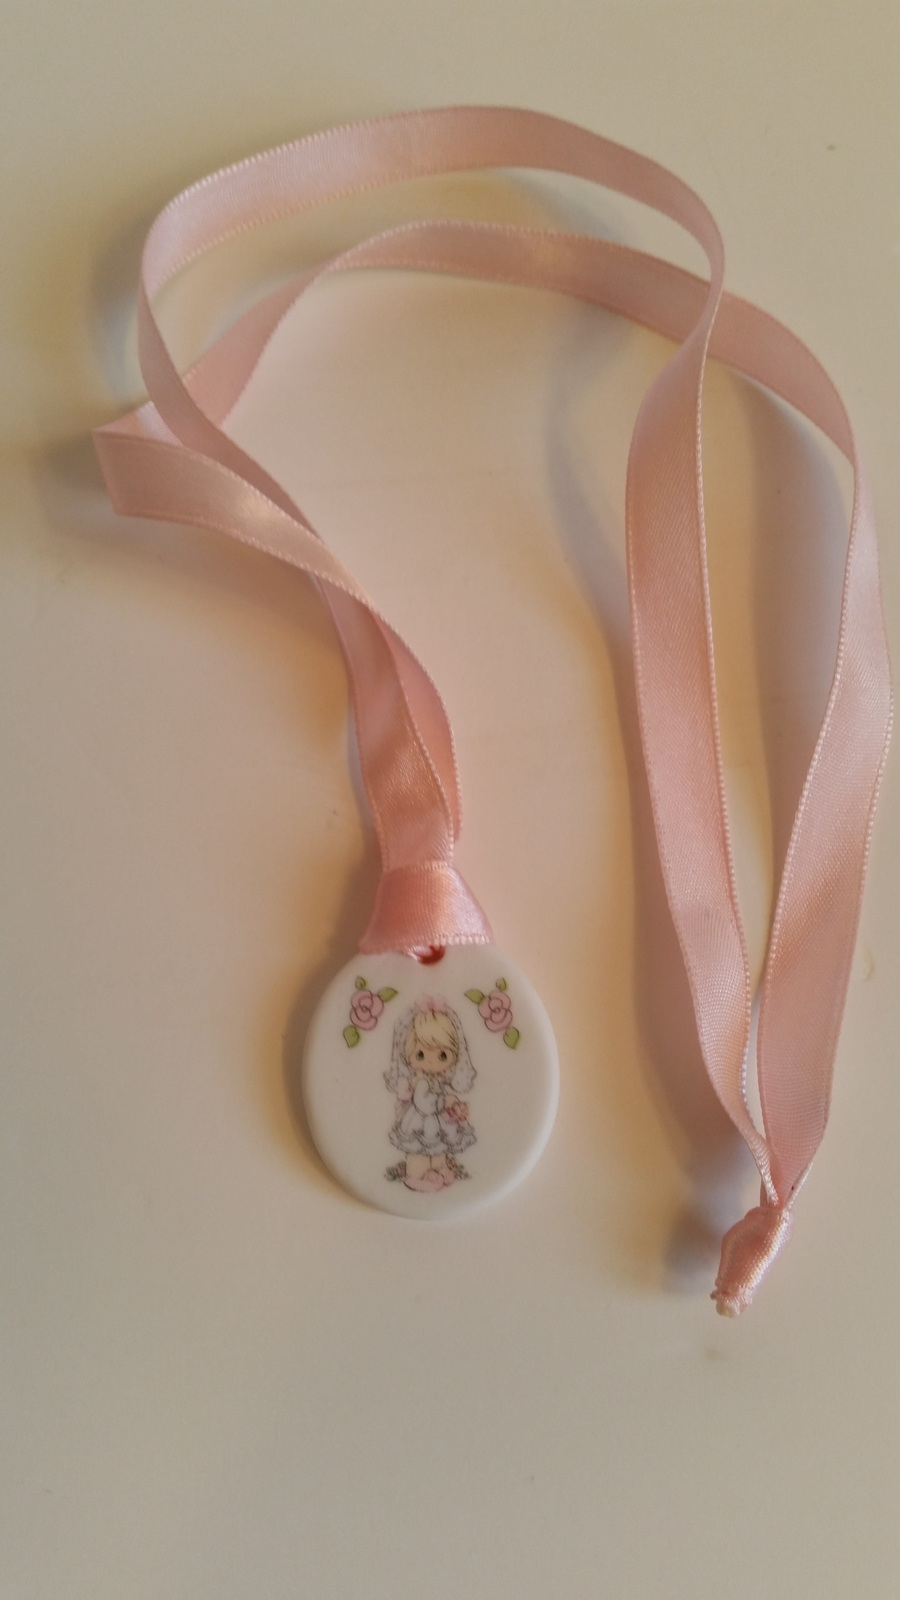 PRECIOUS MOMENT FIRST COMMUNION WEDDING NECKLACE porcelain NEW 1990 ornament